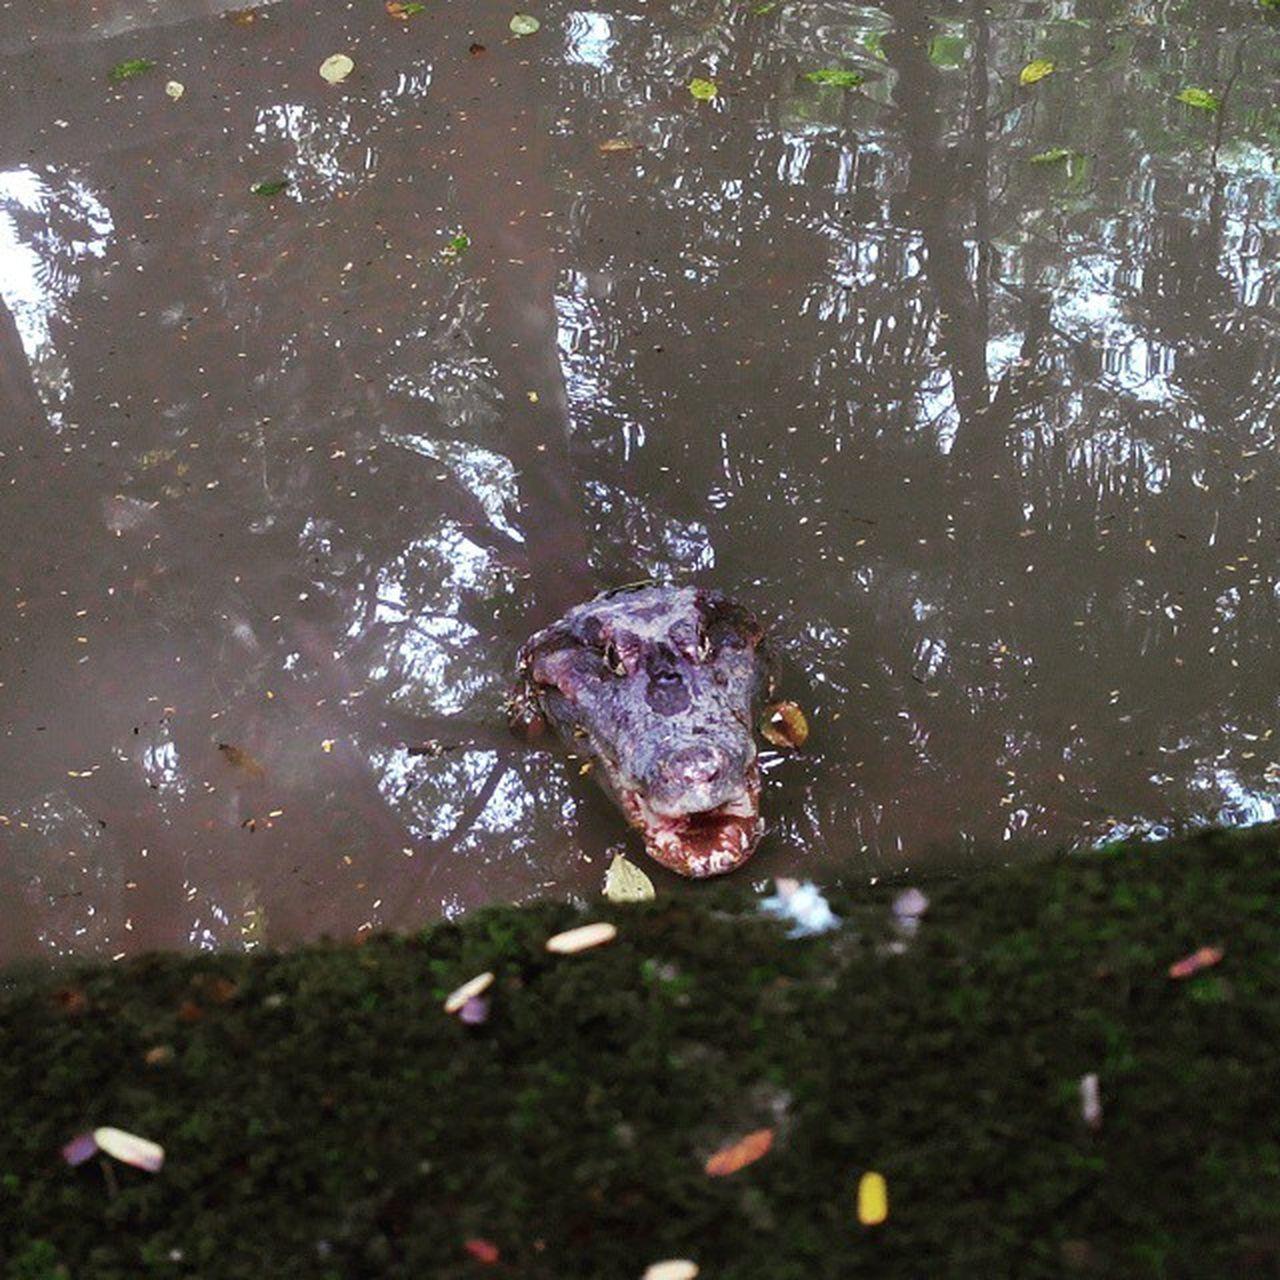 water, one animal, animal themes, animals in the wild, swimming, animal wildlife, nature, reptile, no people, day, outdoors, lake, alligator, underwater, tree, hippopotamus, close-up, mammal